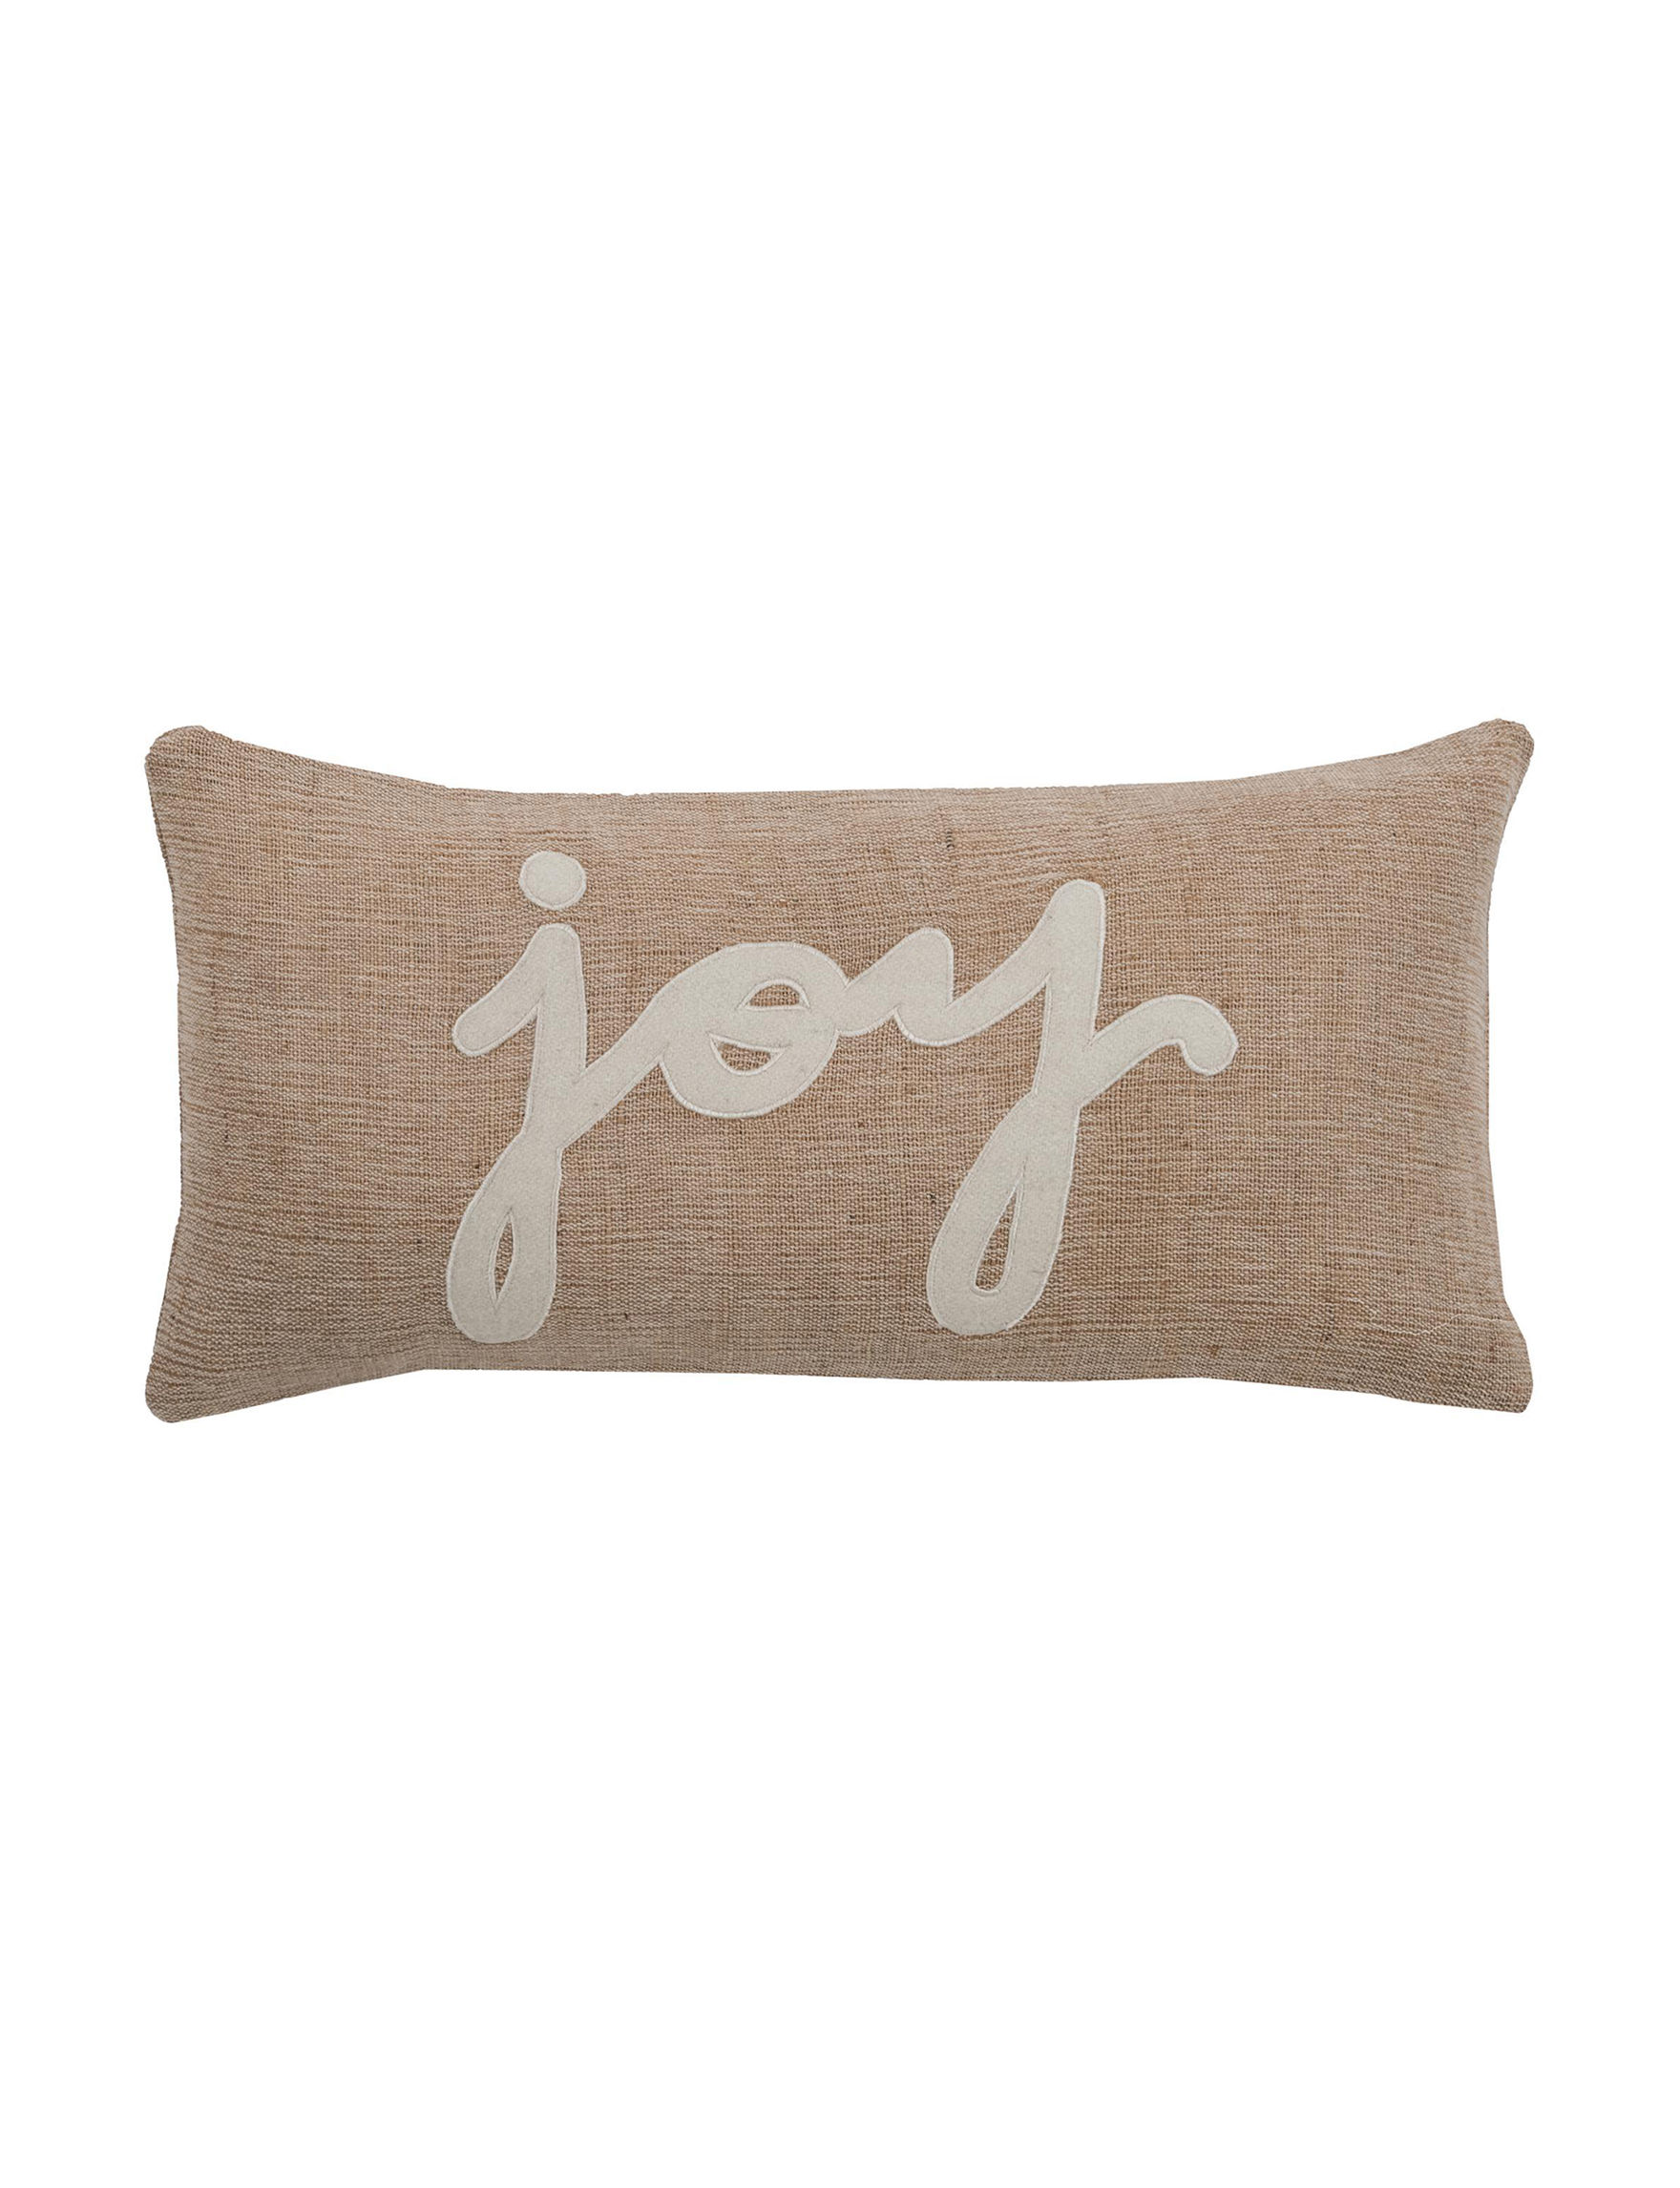 Rizzy Home  Decorative Pillows